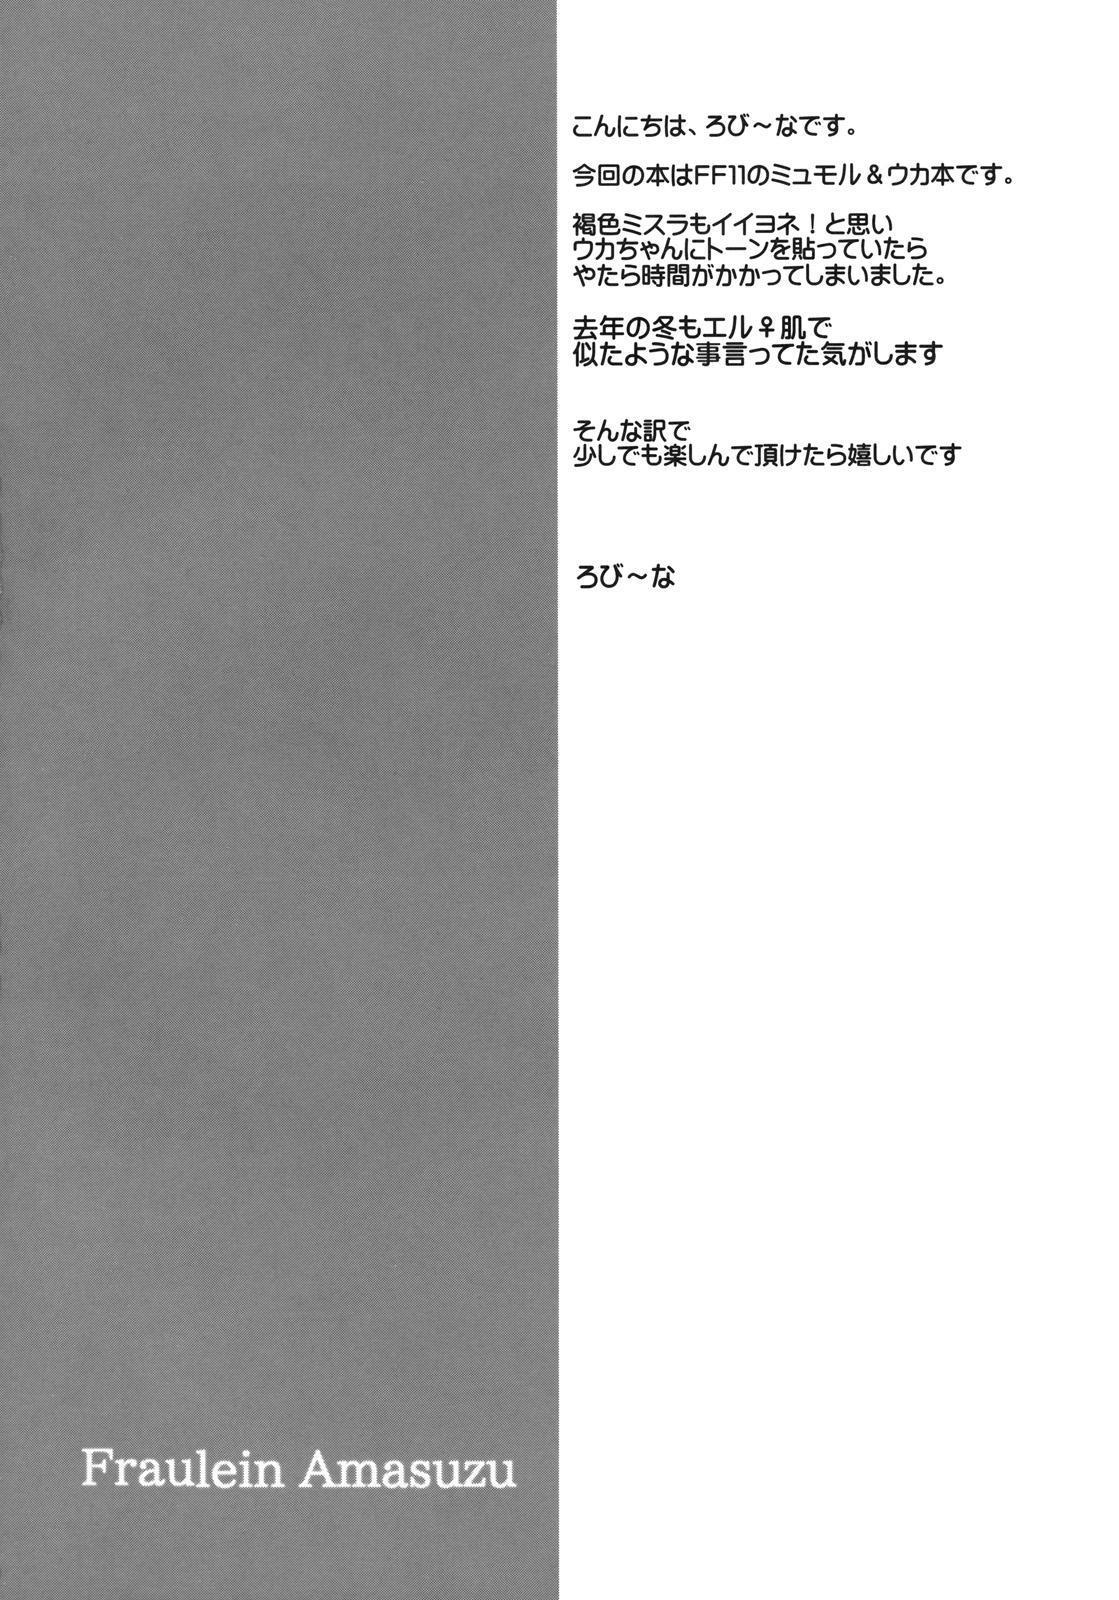 Fraulein Amasuzu 2